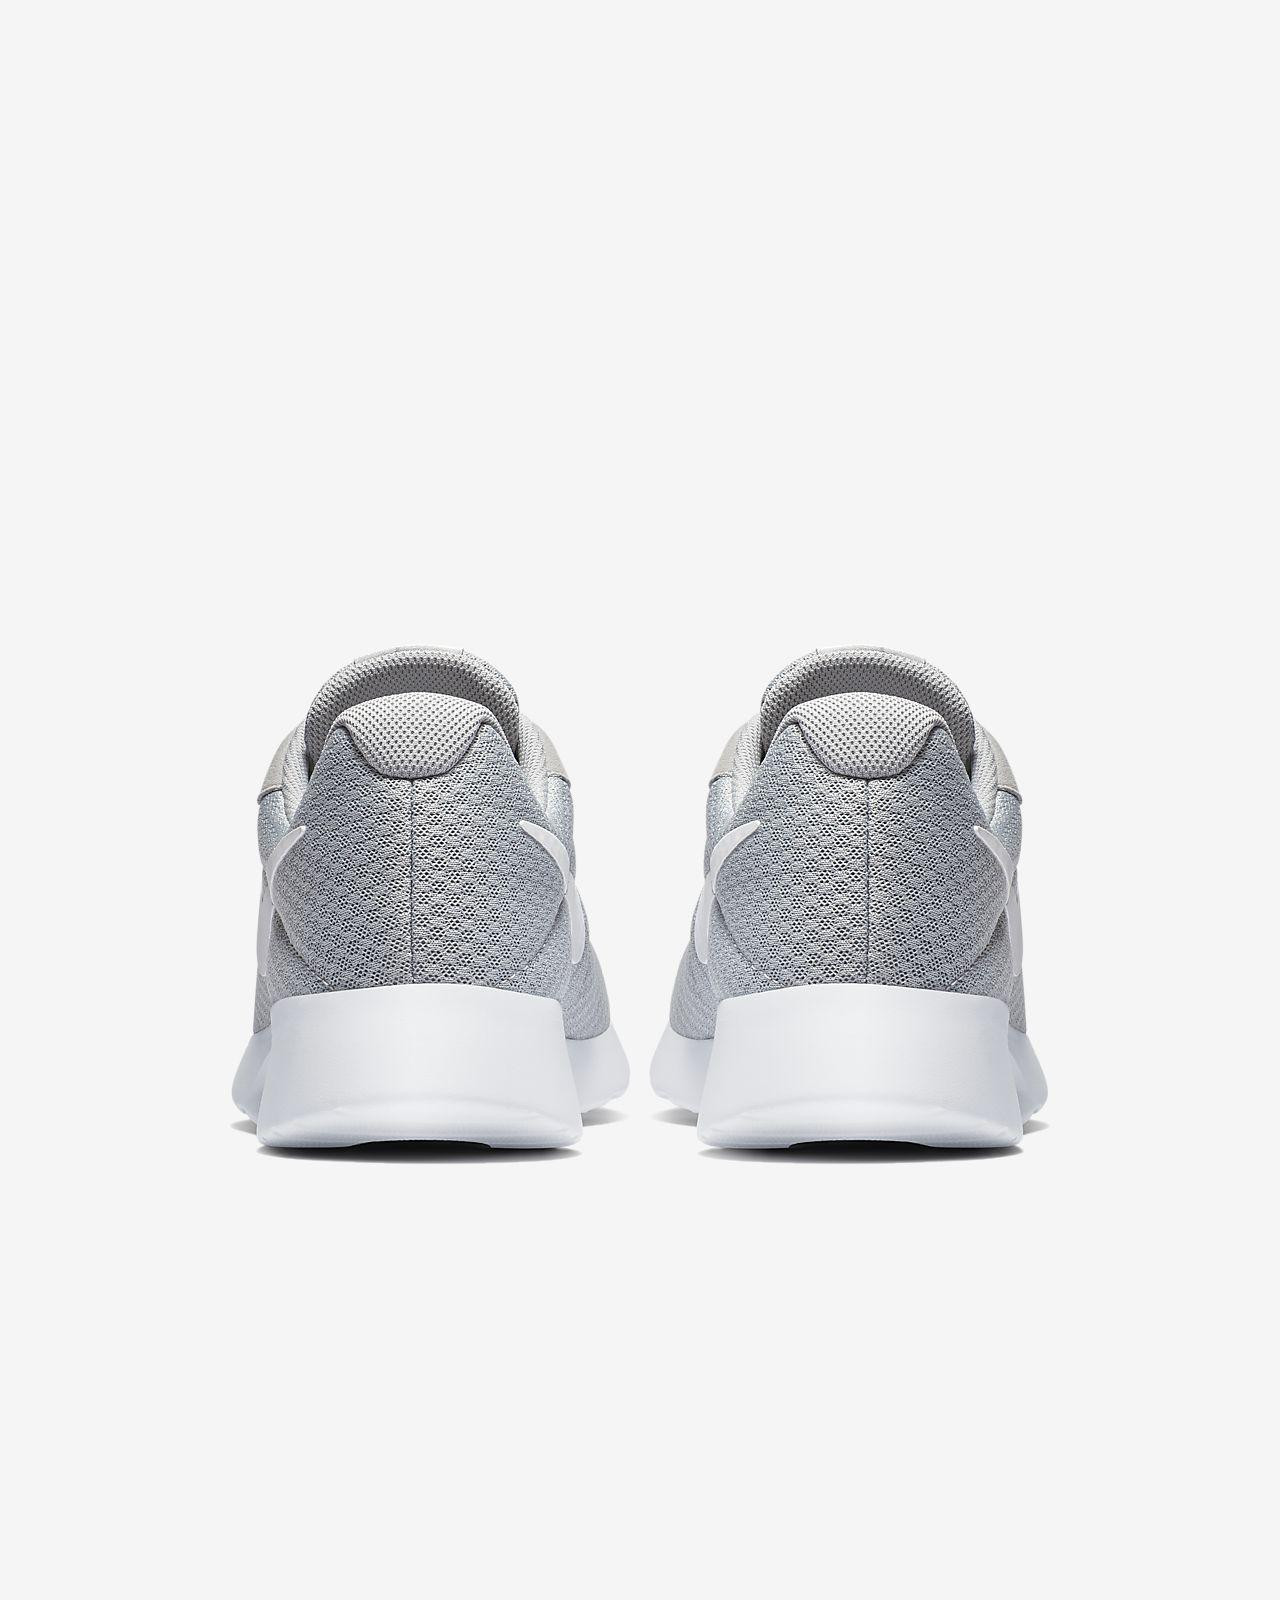 UomoCh Scarpa Scarpa Nike Nike UomoCh Scarpa Scarpa UomoCh Tanjun Nike Tanjun Tanjun E29WDHI